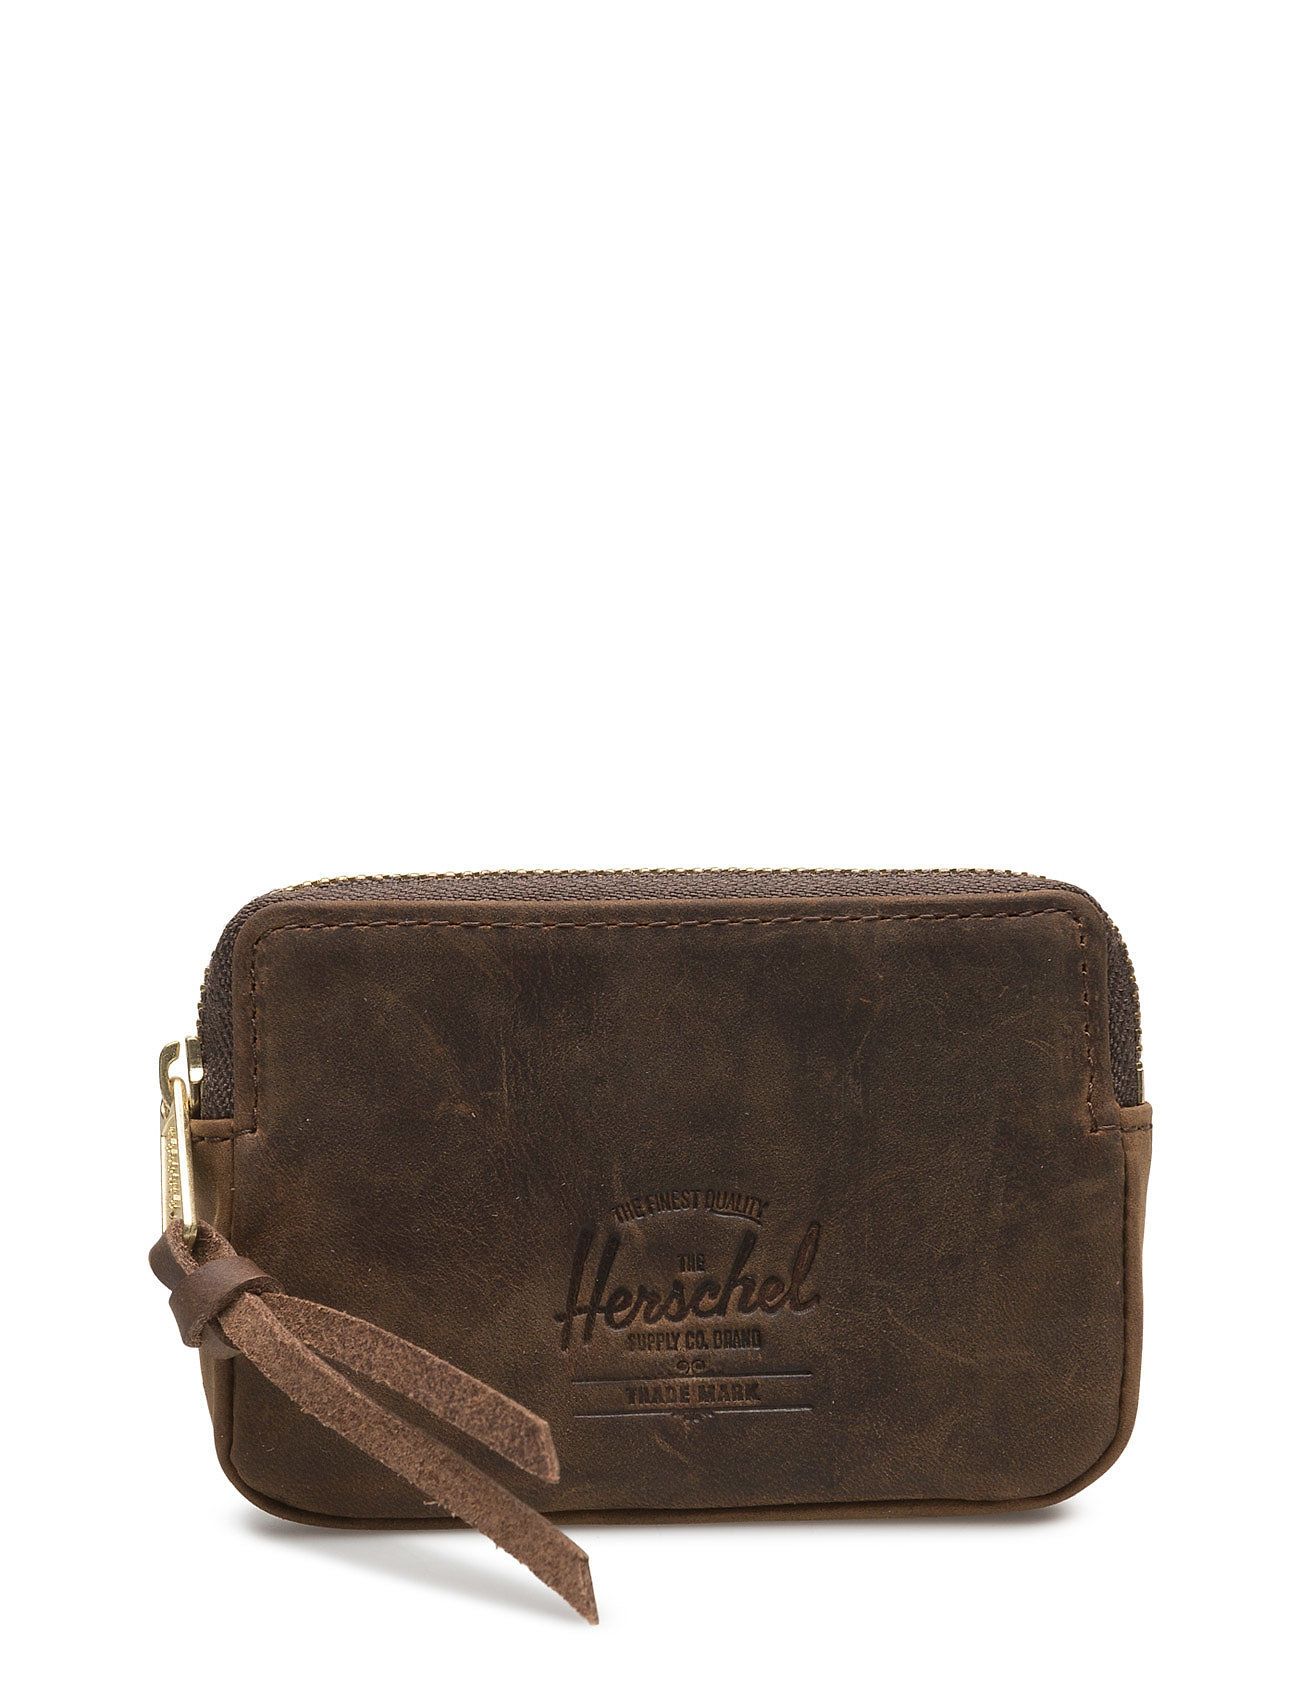 Oxford pouch leather rfid fra herschel fra boozt.com dk